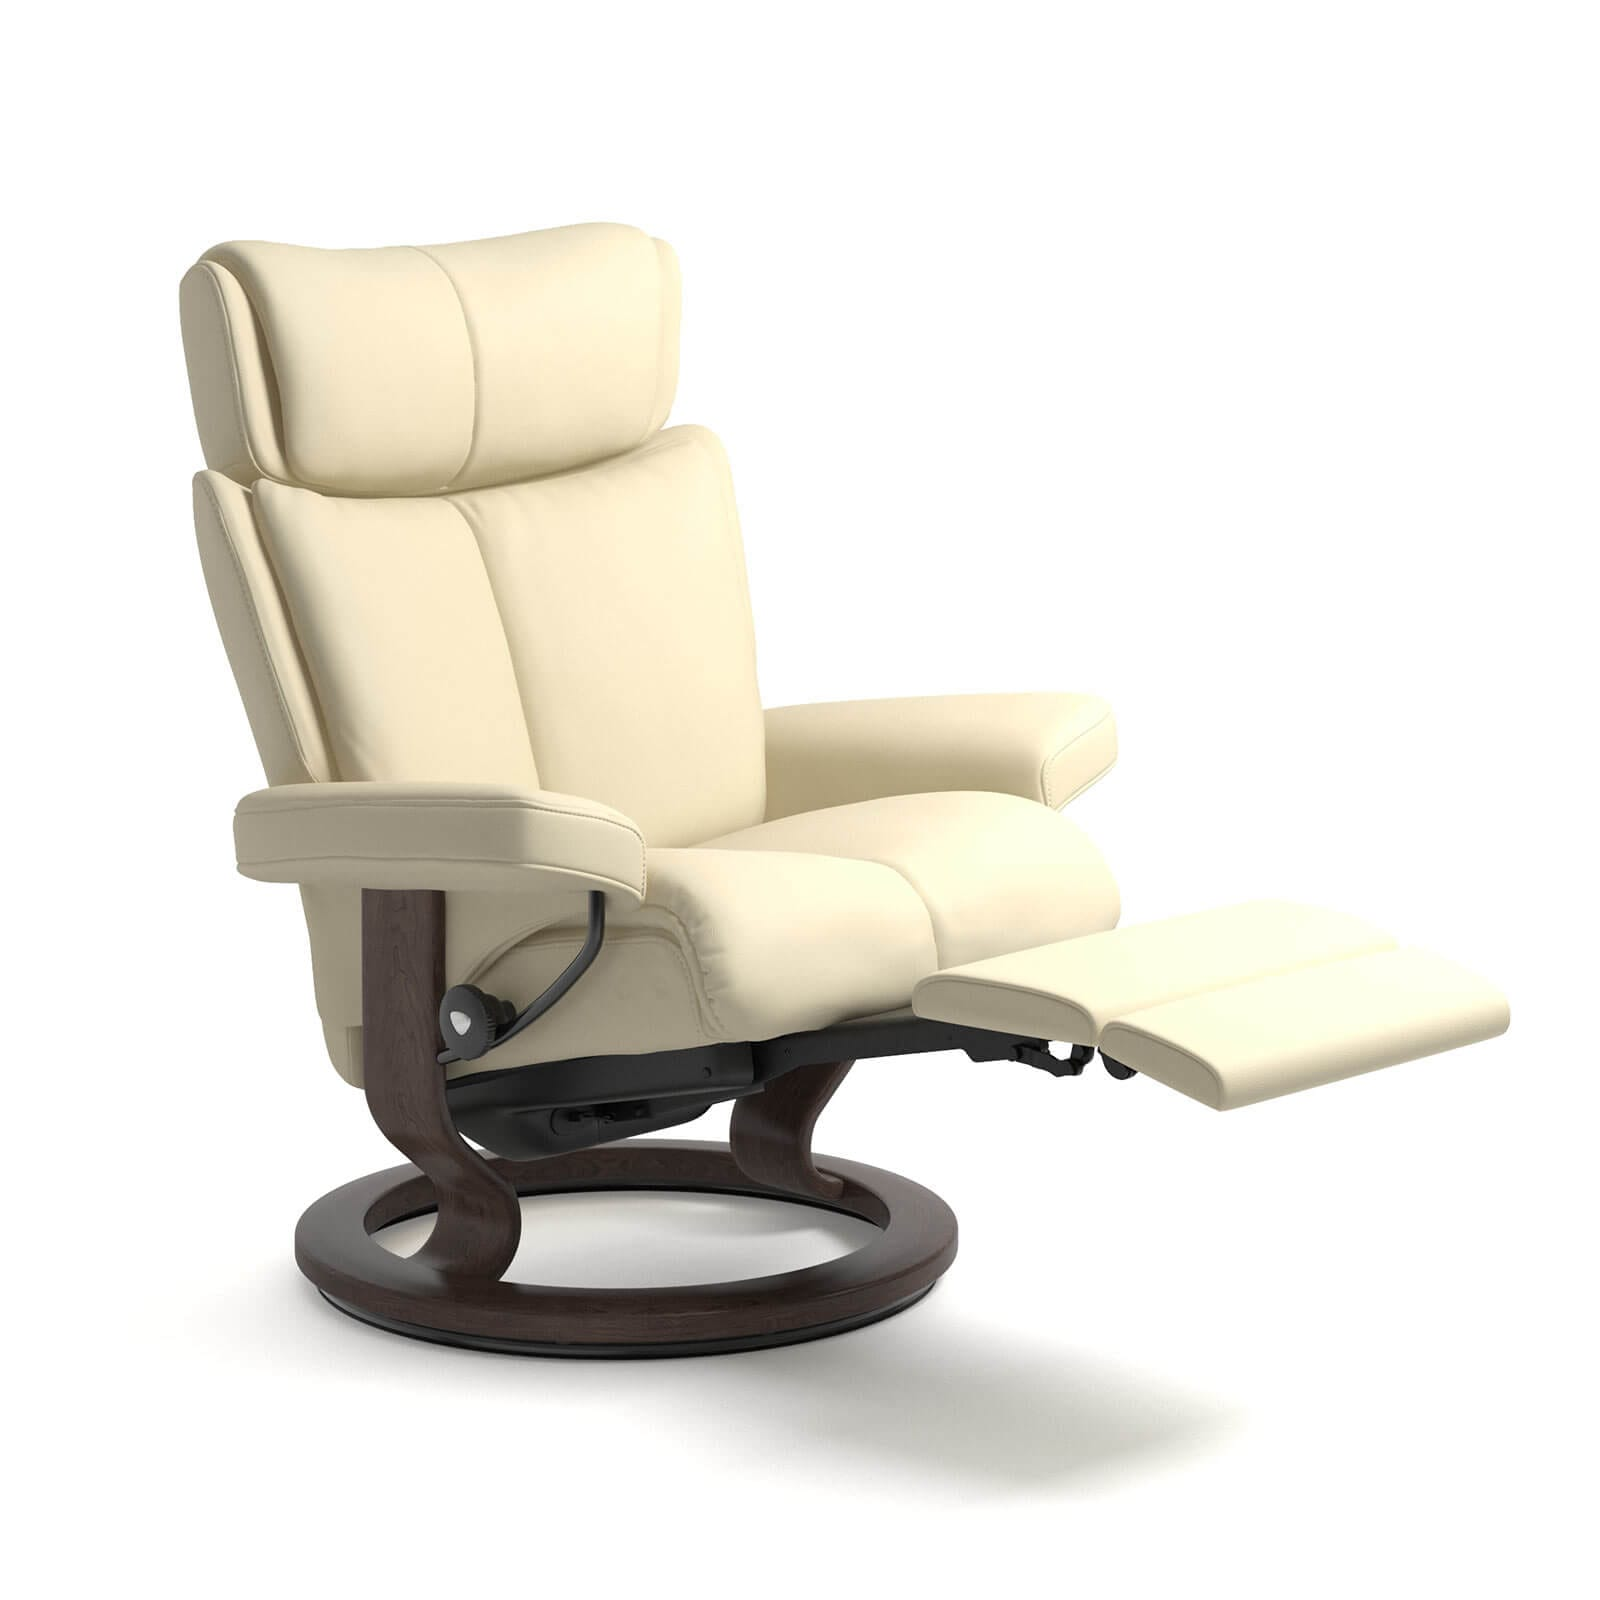 stressless magic legcomfort vanilla stressless online shop. Black Bedroom Furniture Sets. Home Design Ideas